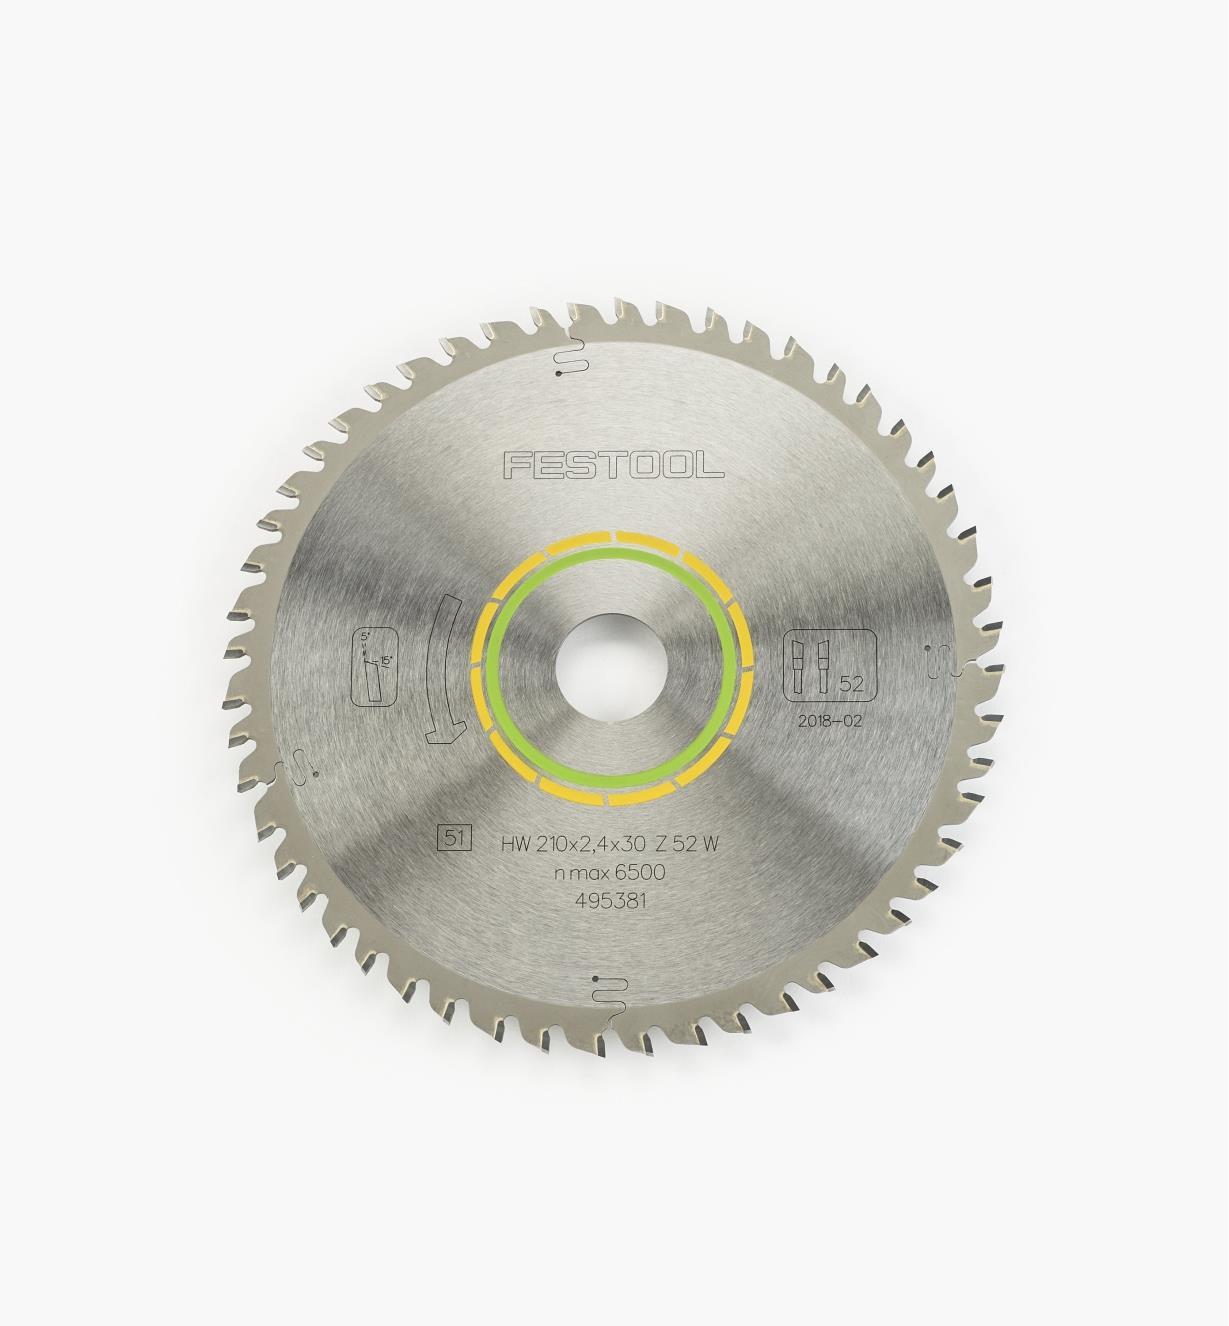 ZA495381 - TS 75 Lame scie à dents fines